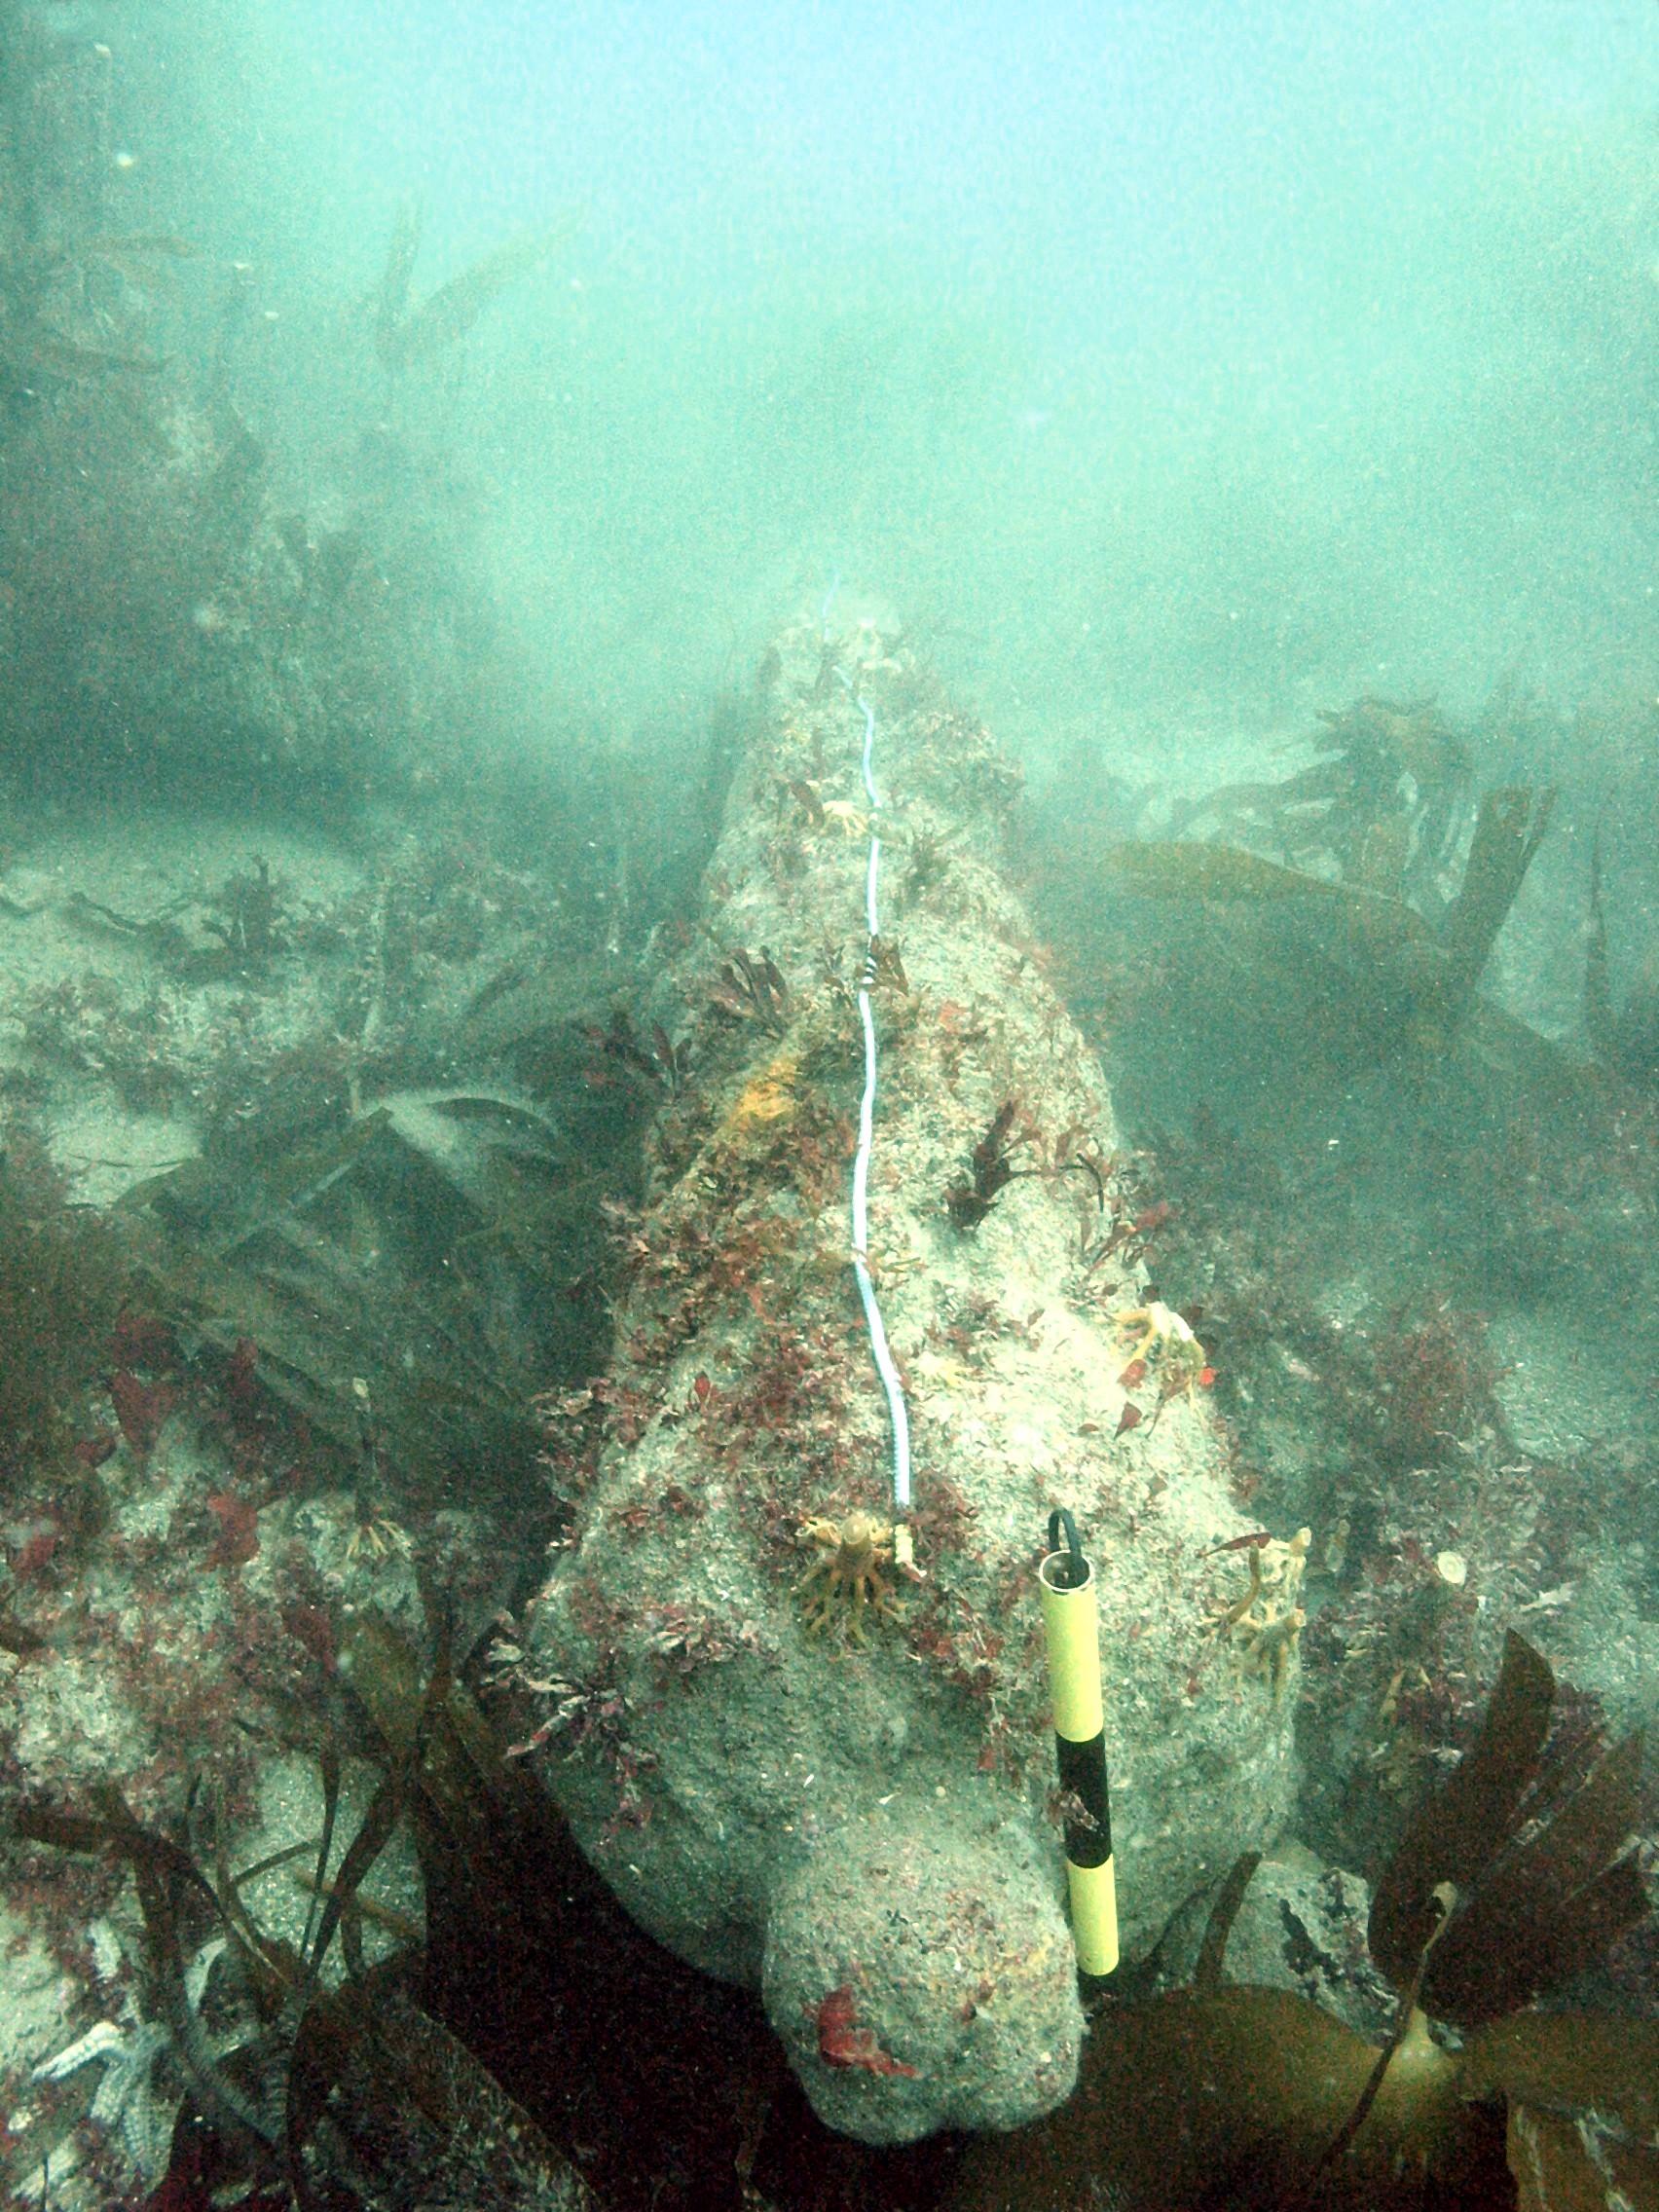 Cannon at the Coronation wrecksite